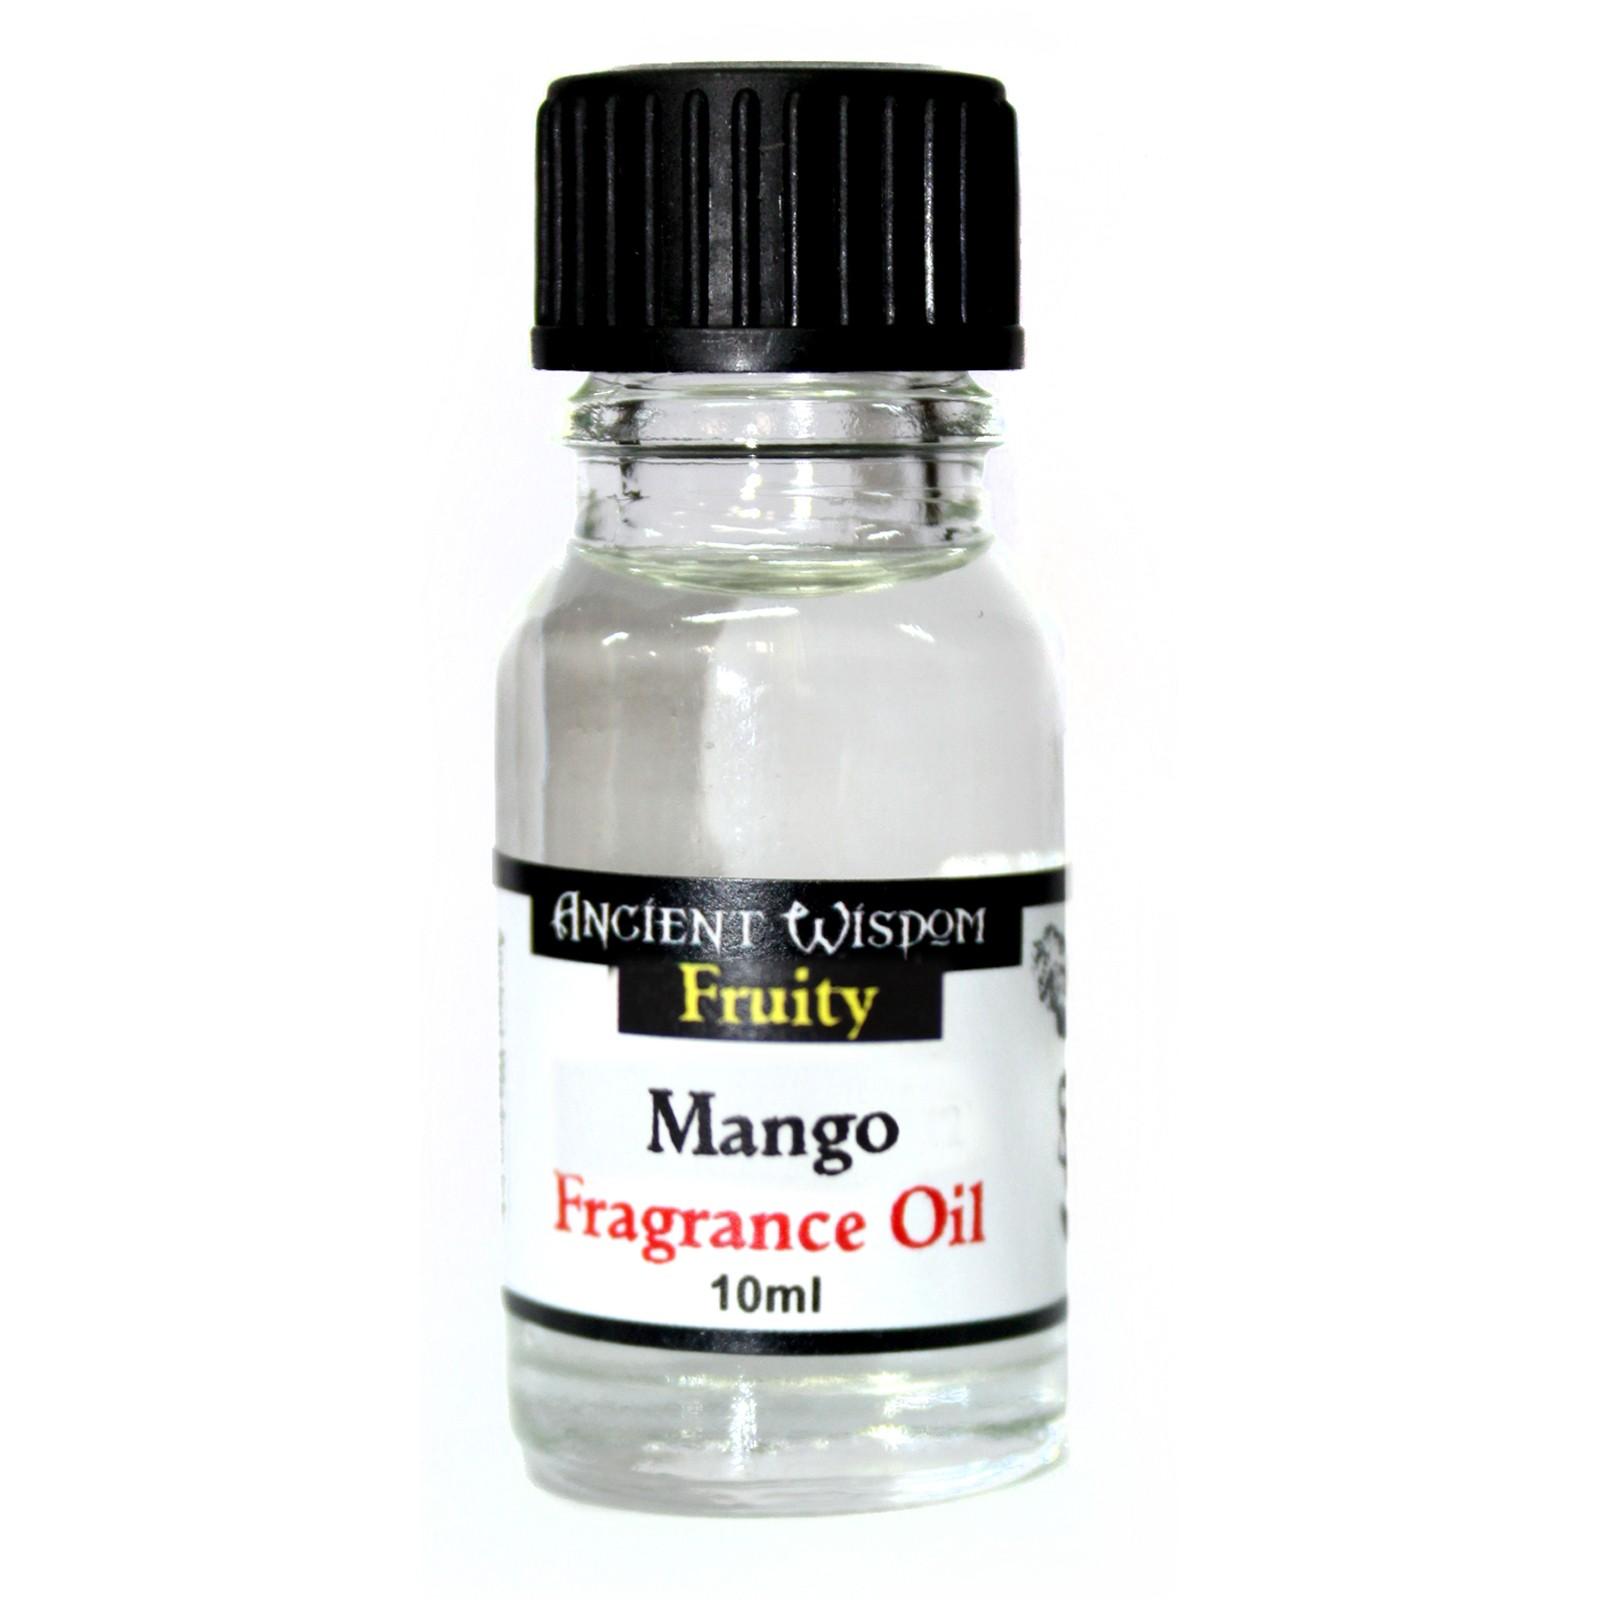 10ml Mango Fragrance Oil